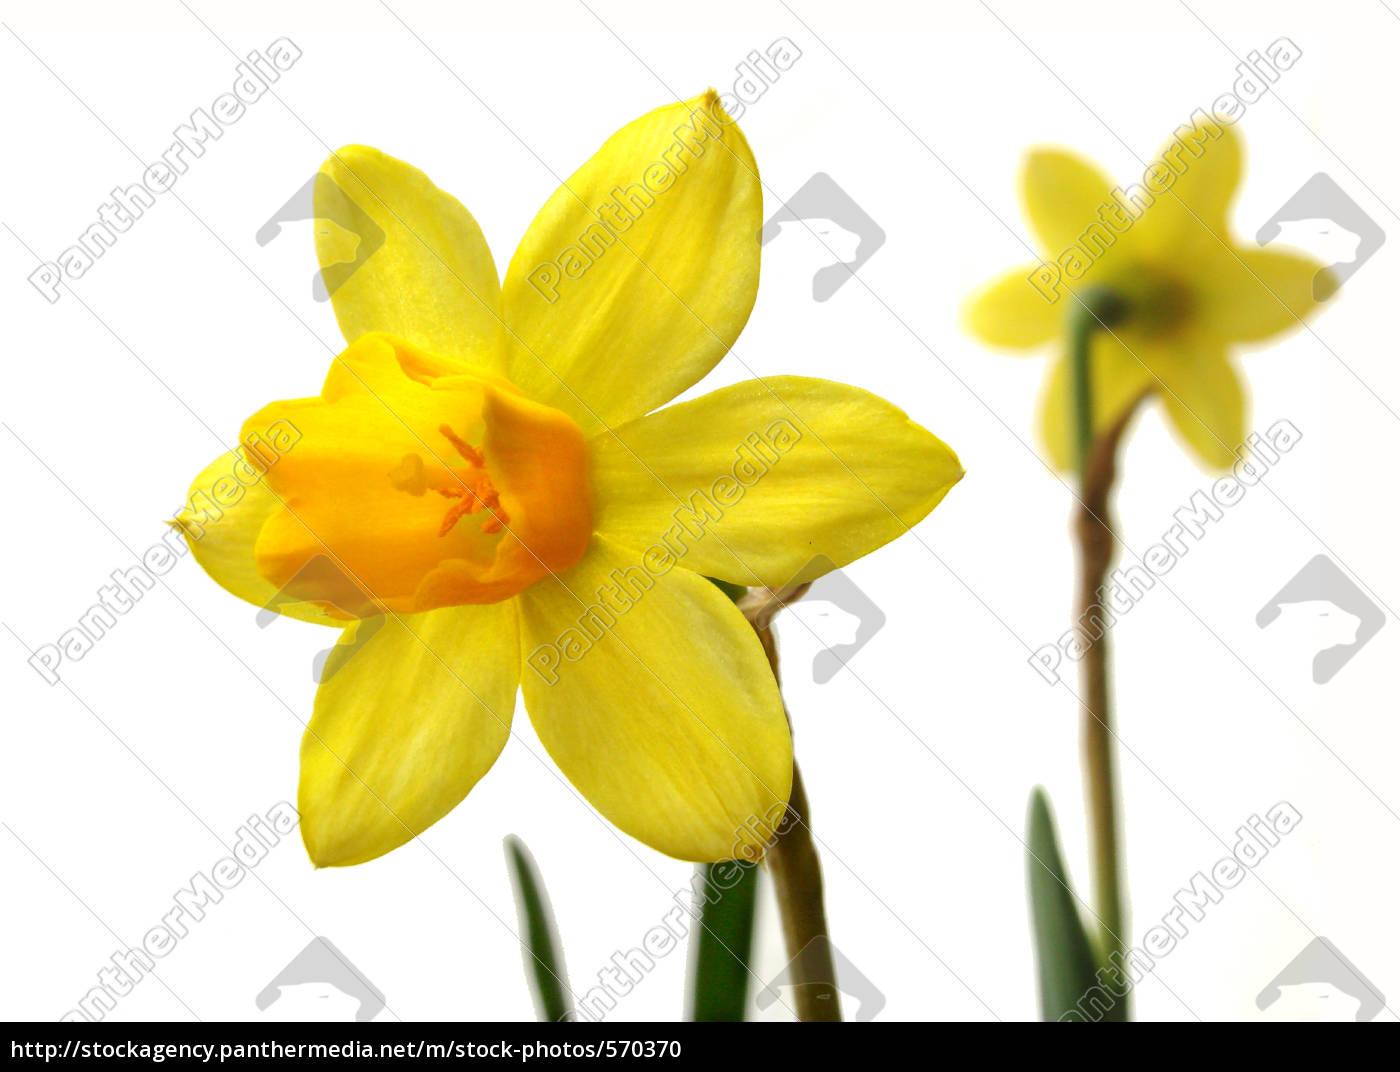 daffodils - 570370